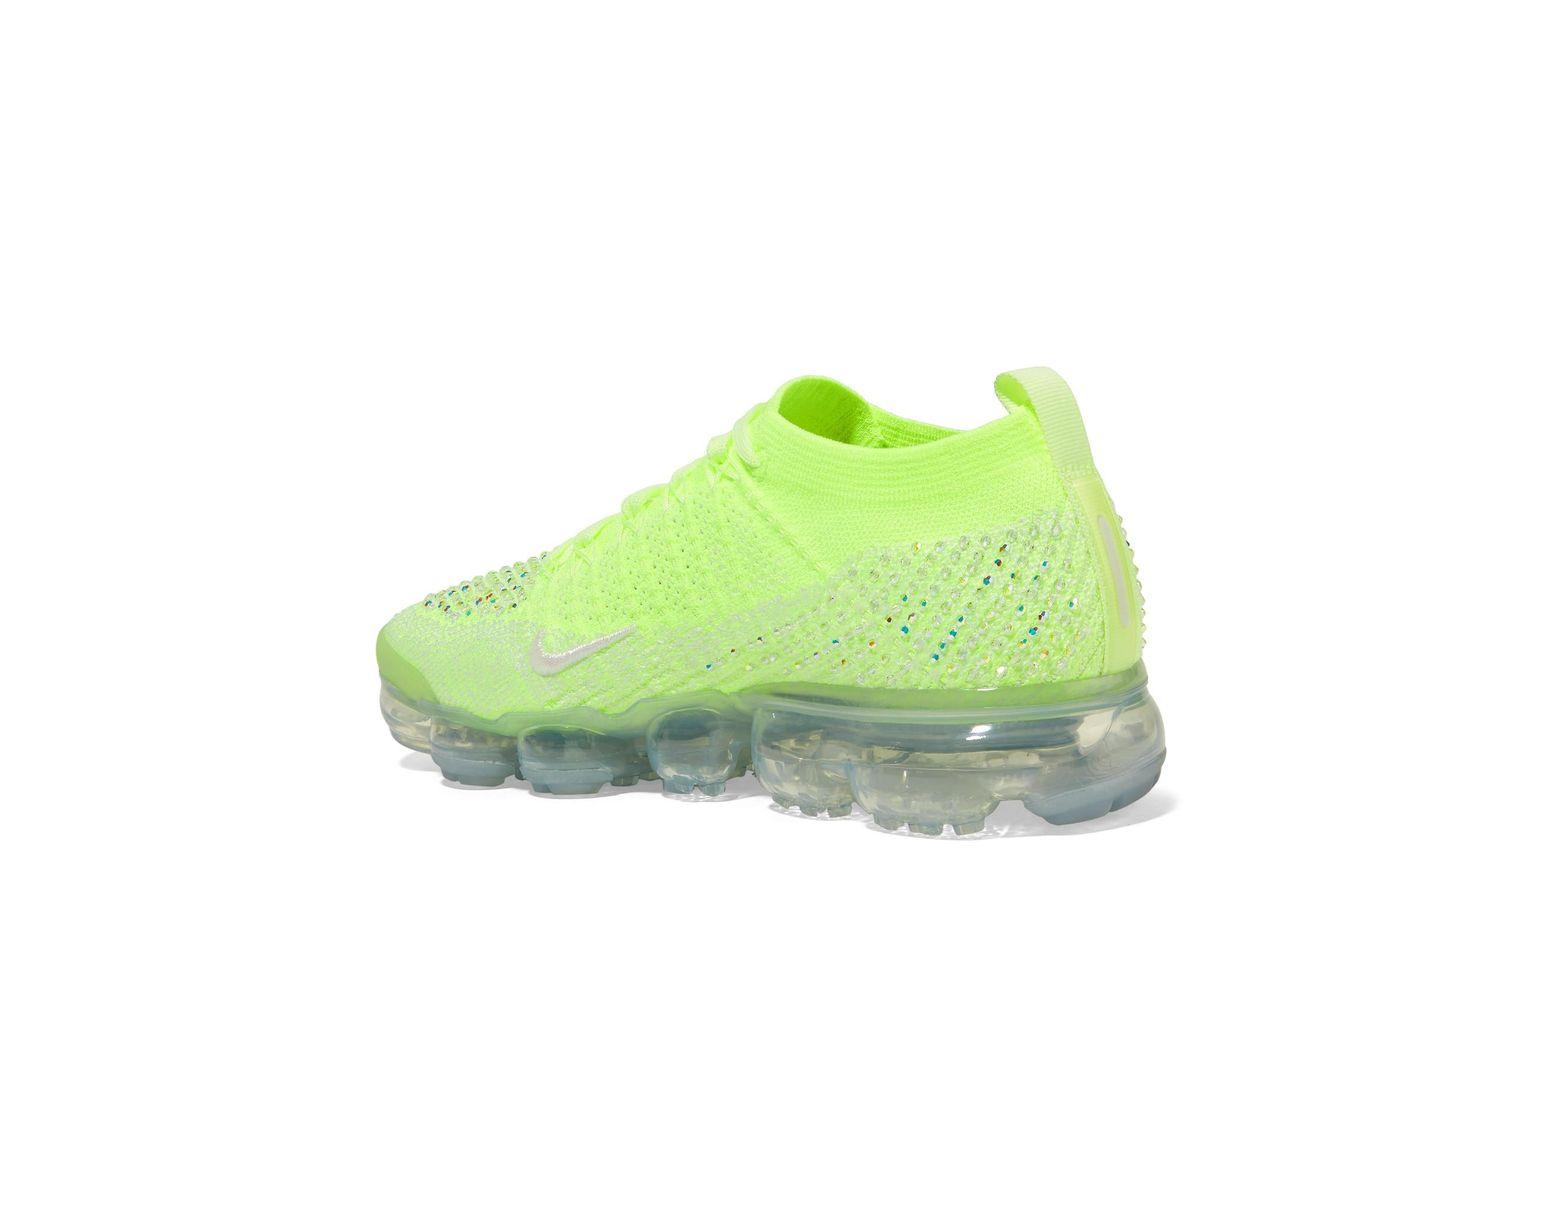 72069fa6d038 Lyst - Nike Air Vapormax 2 Swarovski Crystal-embellished Flyknit Sneakers  in Green